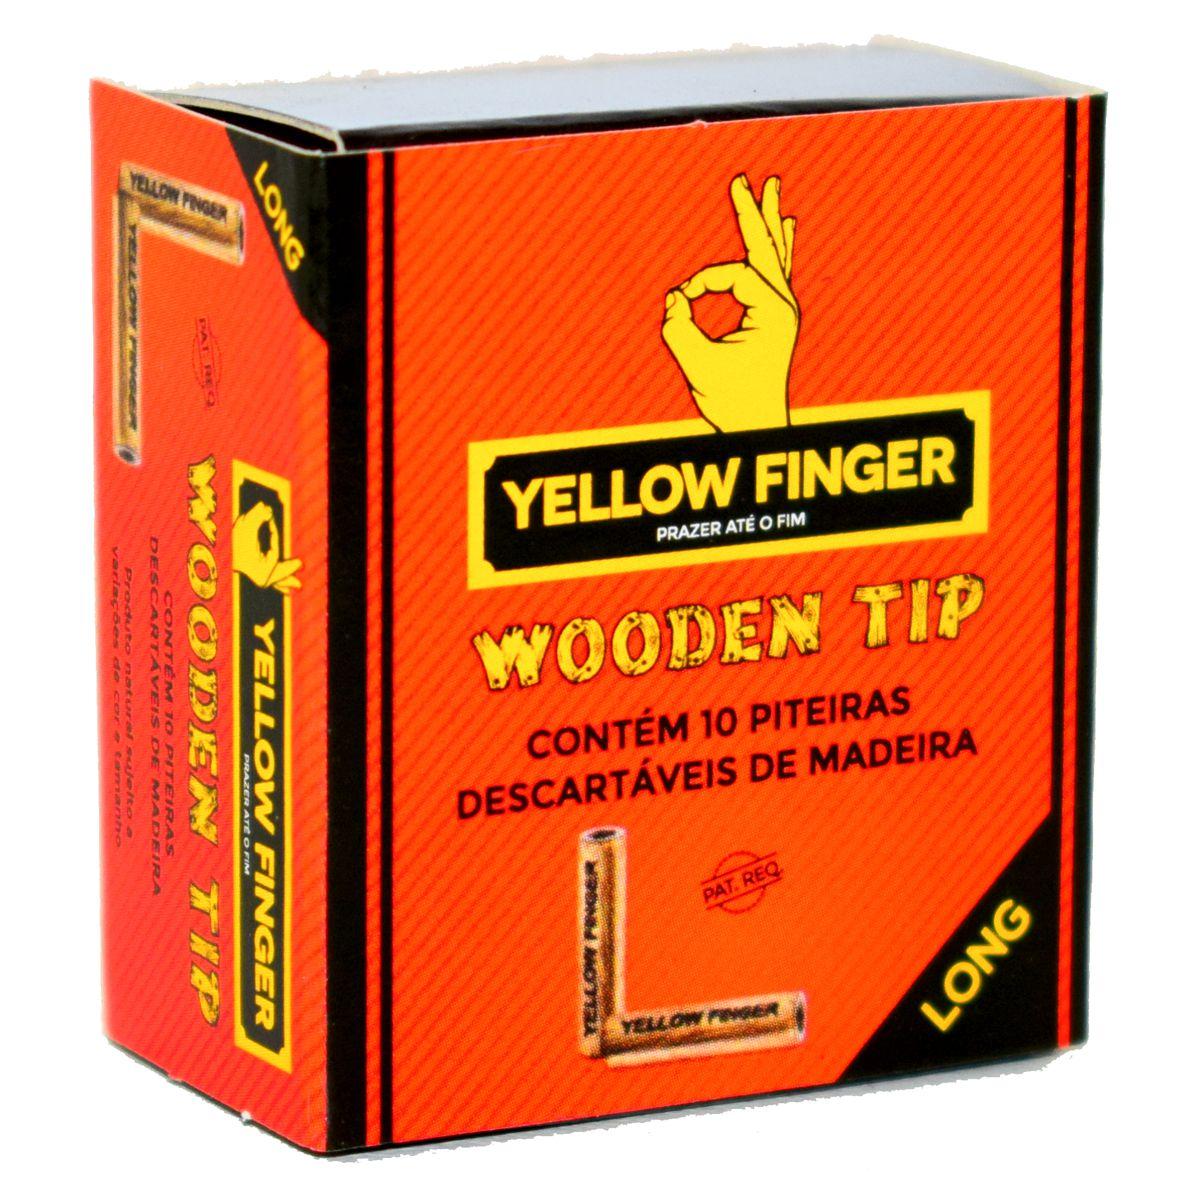 filtros yellow finger long precio tabaqueria